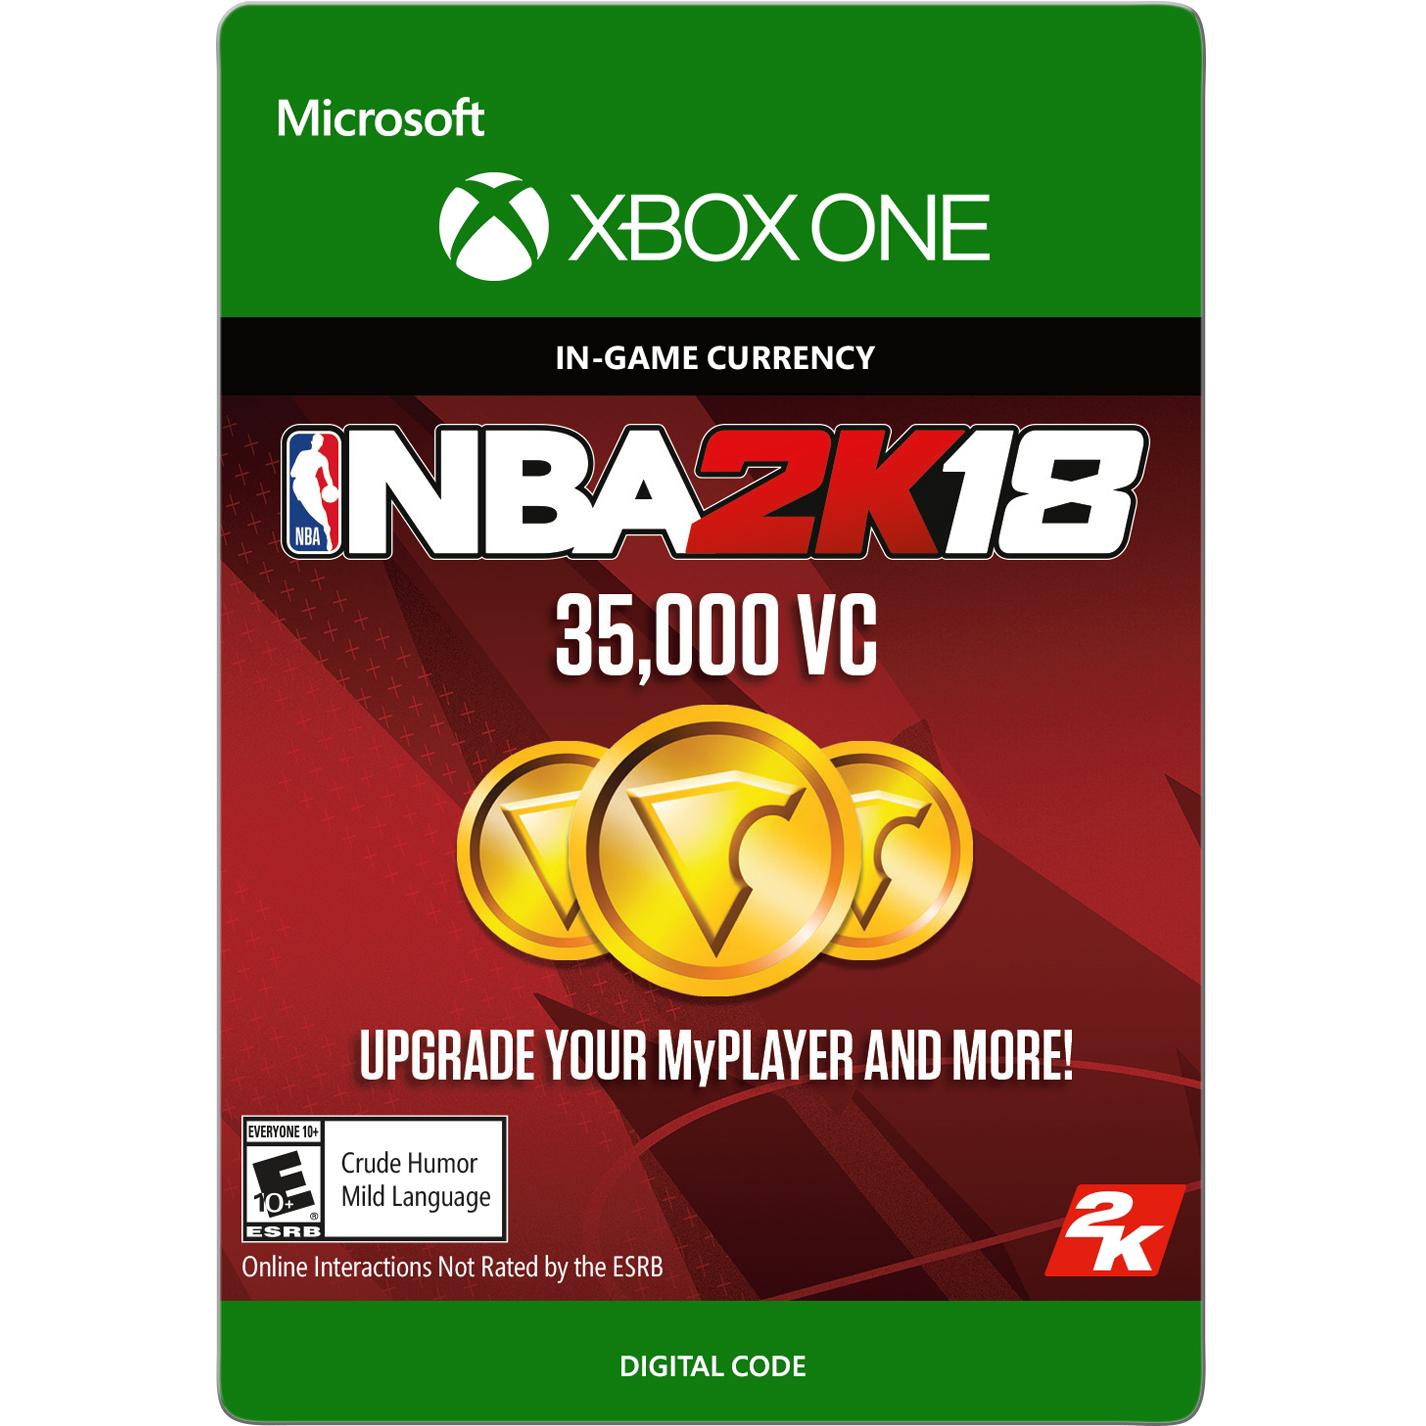 NBA 2K18 35,000 VC (Digital Download), 2K, Xbox One, 799366468424